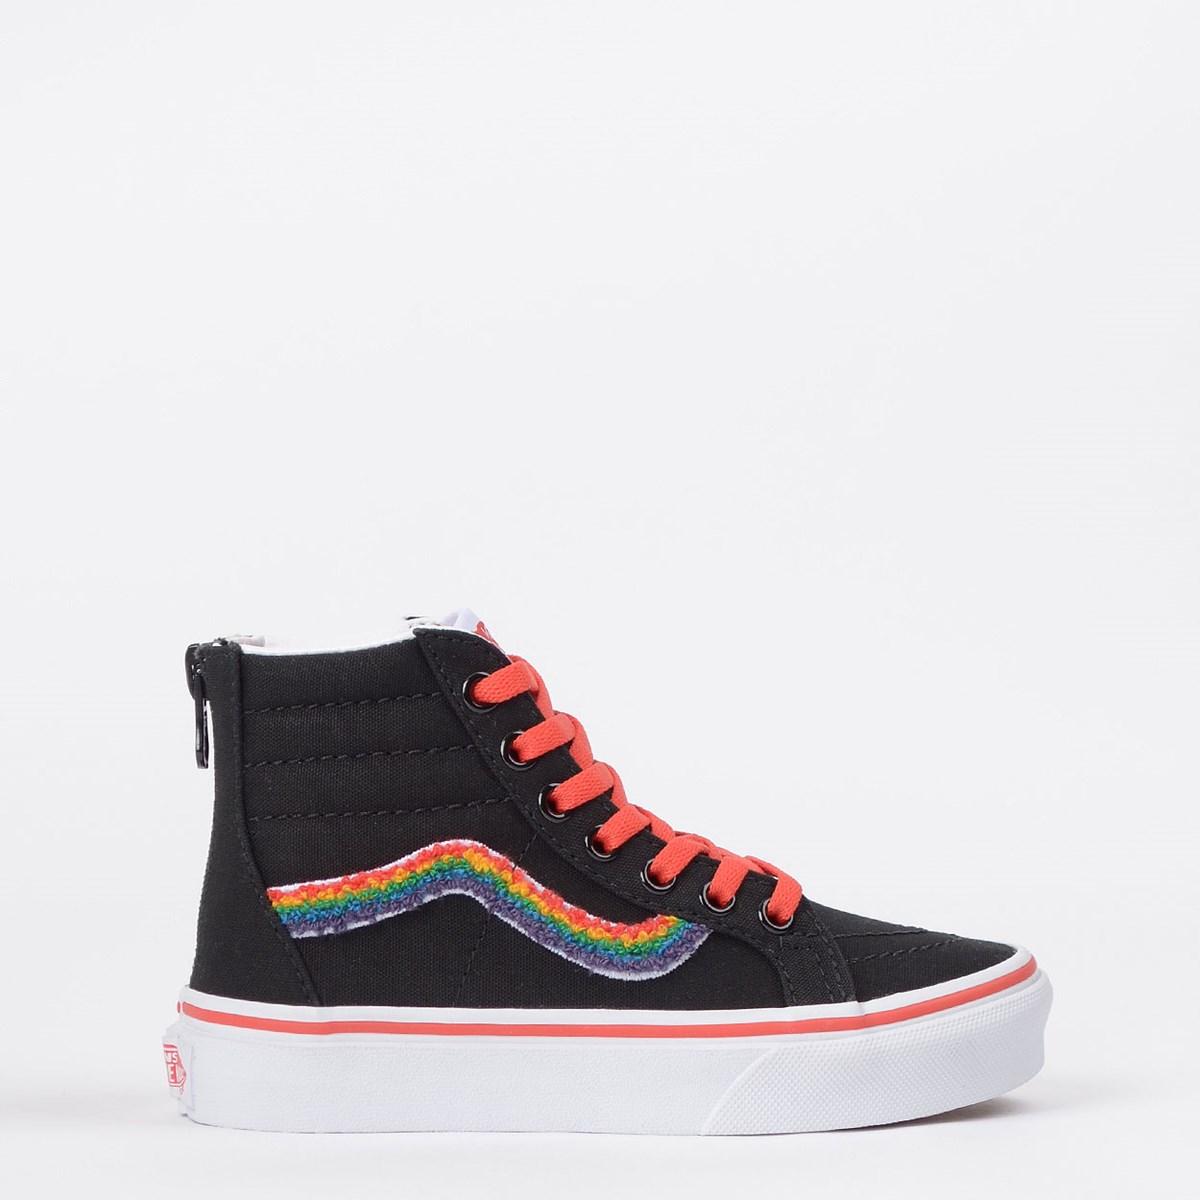 Tênis Vans Kids Sk8 Hi Zip Chenille Rainbow VN0A4BUXWKT